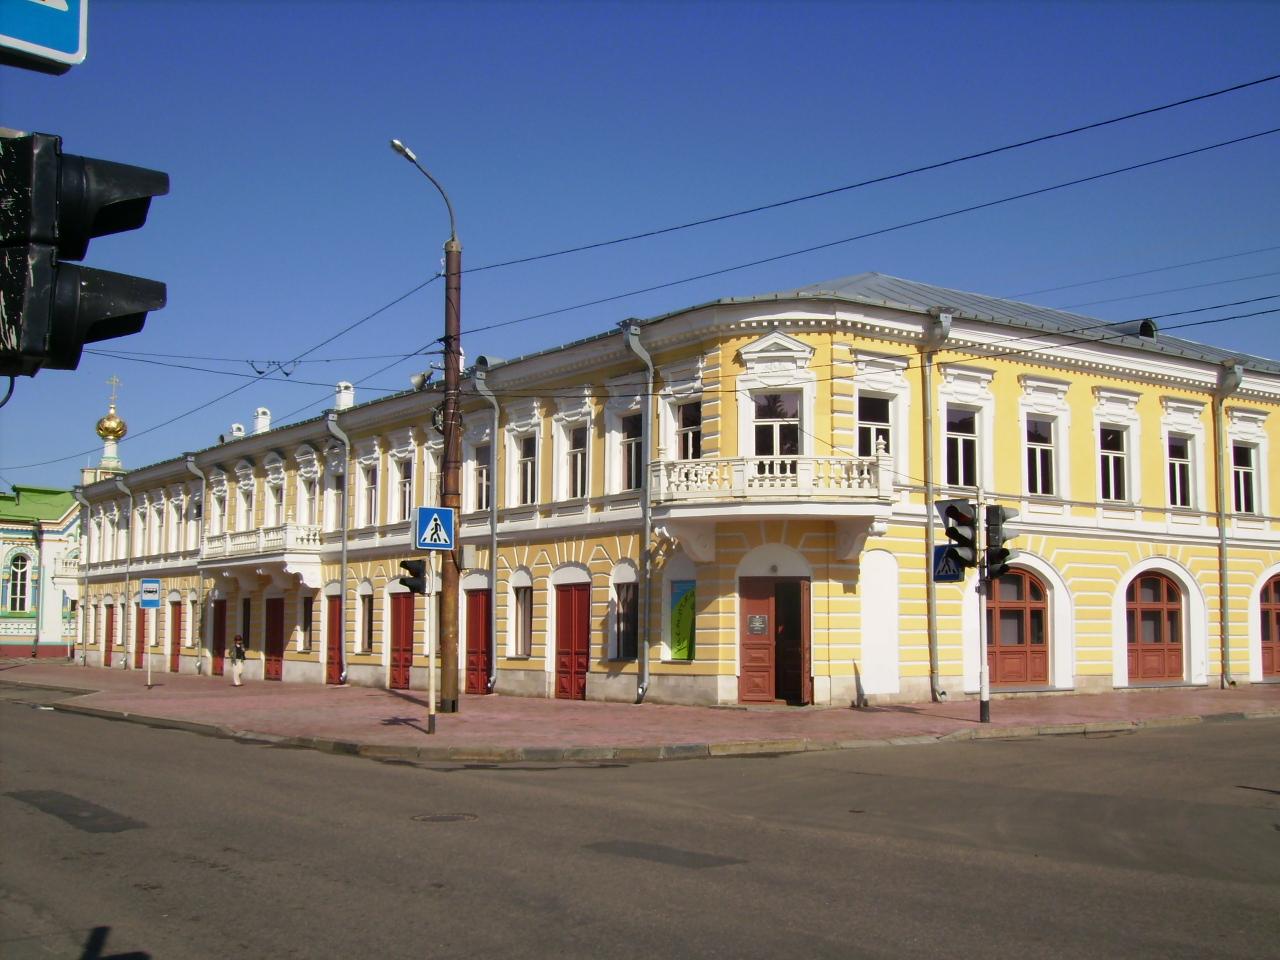 http://larsamoor.narod.ru/pict003201.jpg